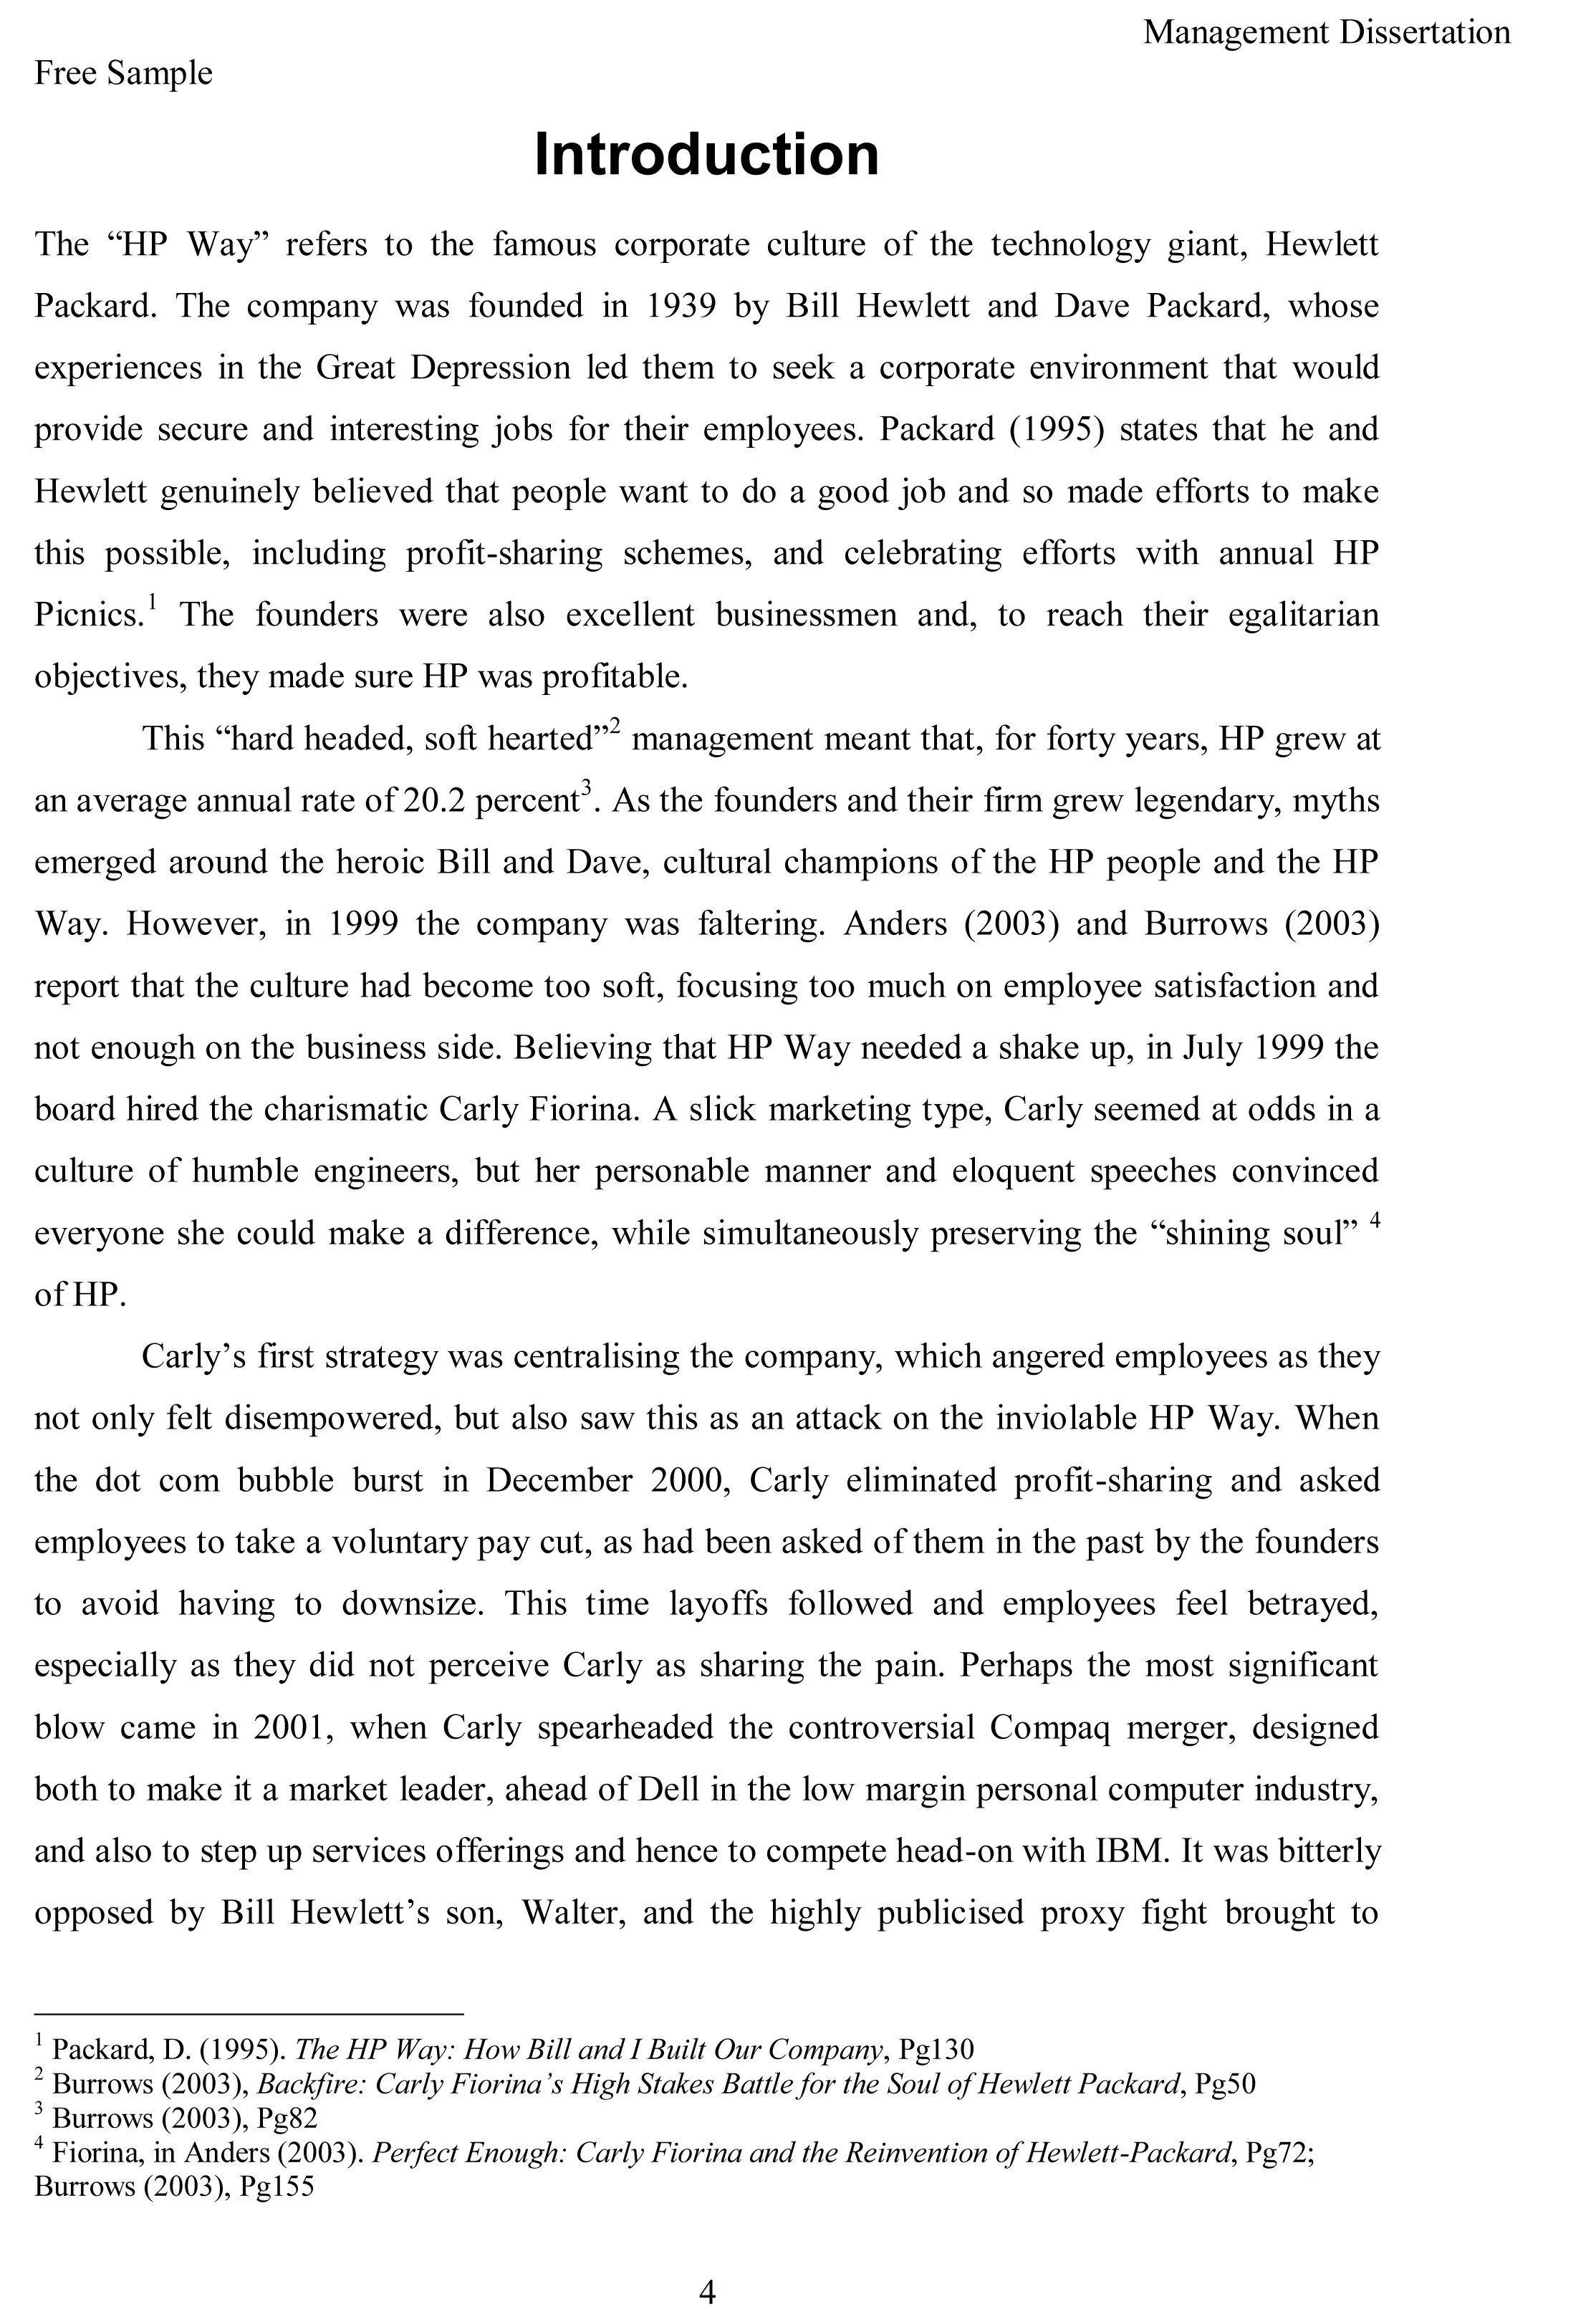 008 Unusual Essay Paper High Resolution  Upsc 2019 In Hindi Pdf Format Cs Past 2018Full